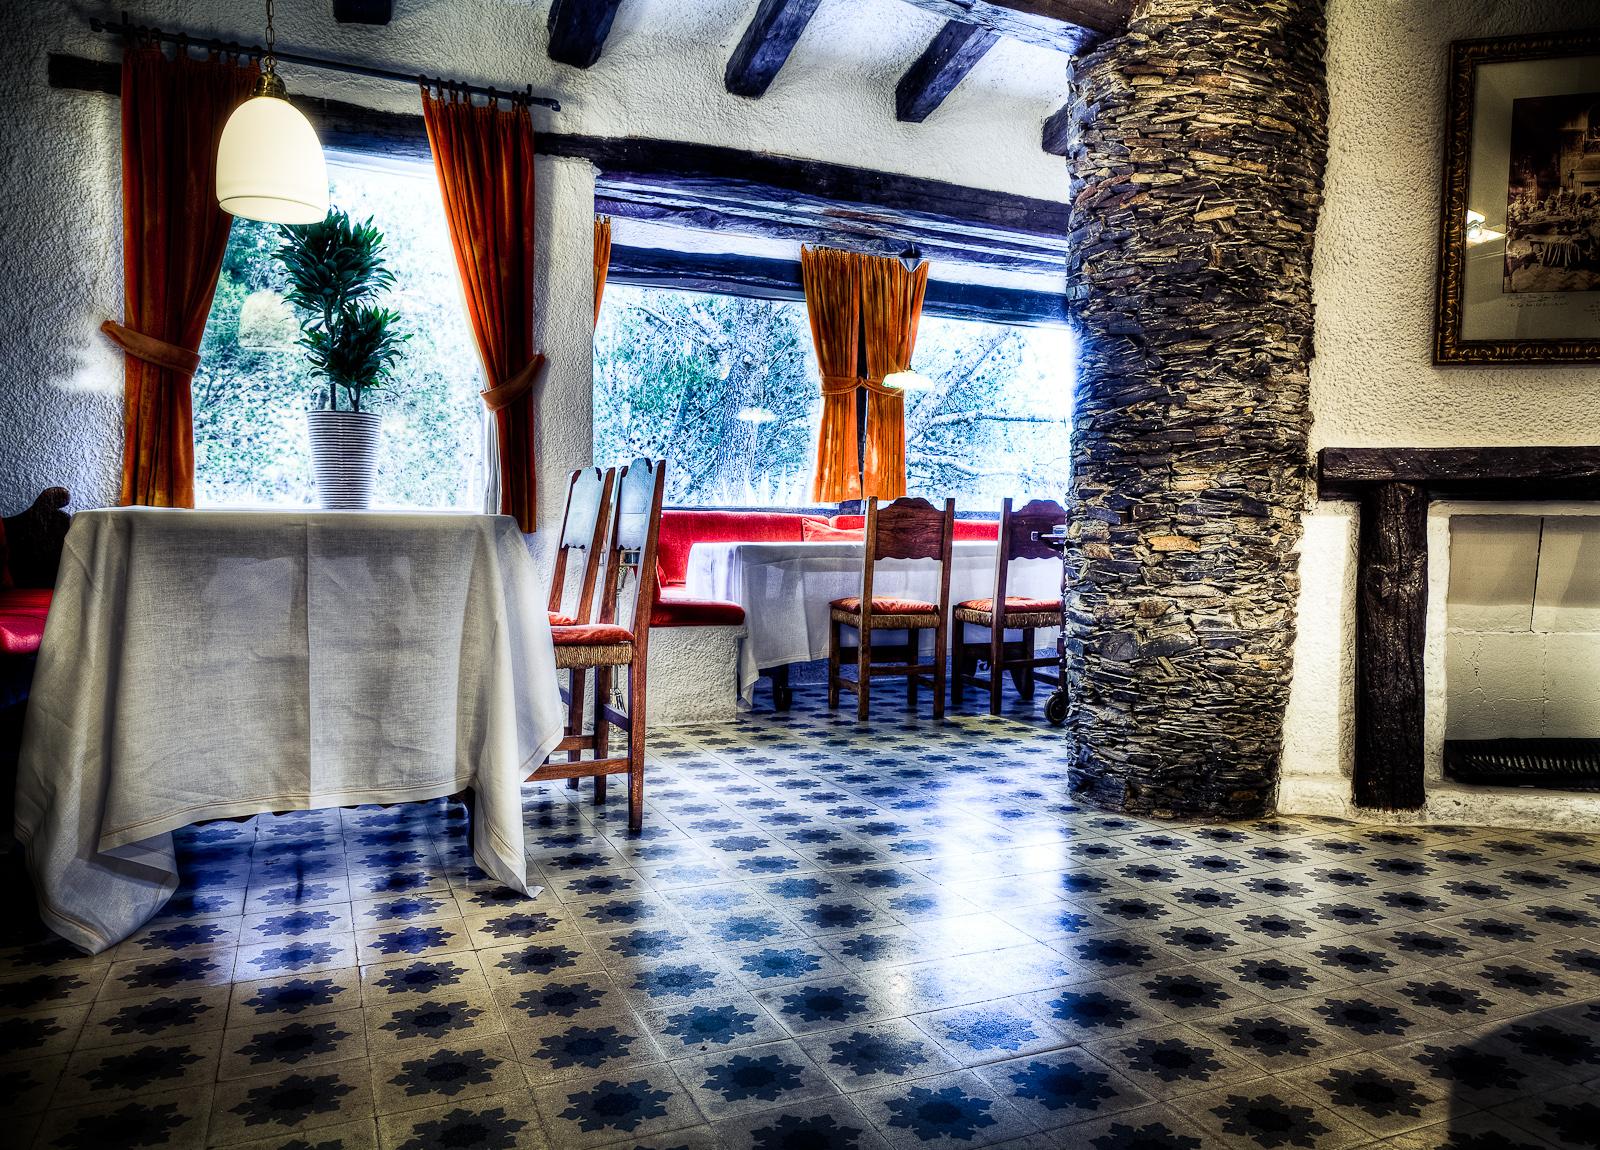 El Bulli, Spain - The Dining Room